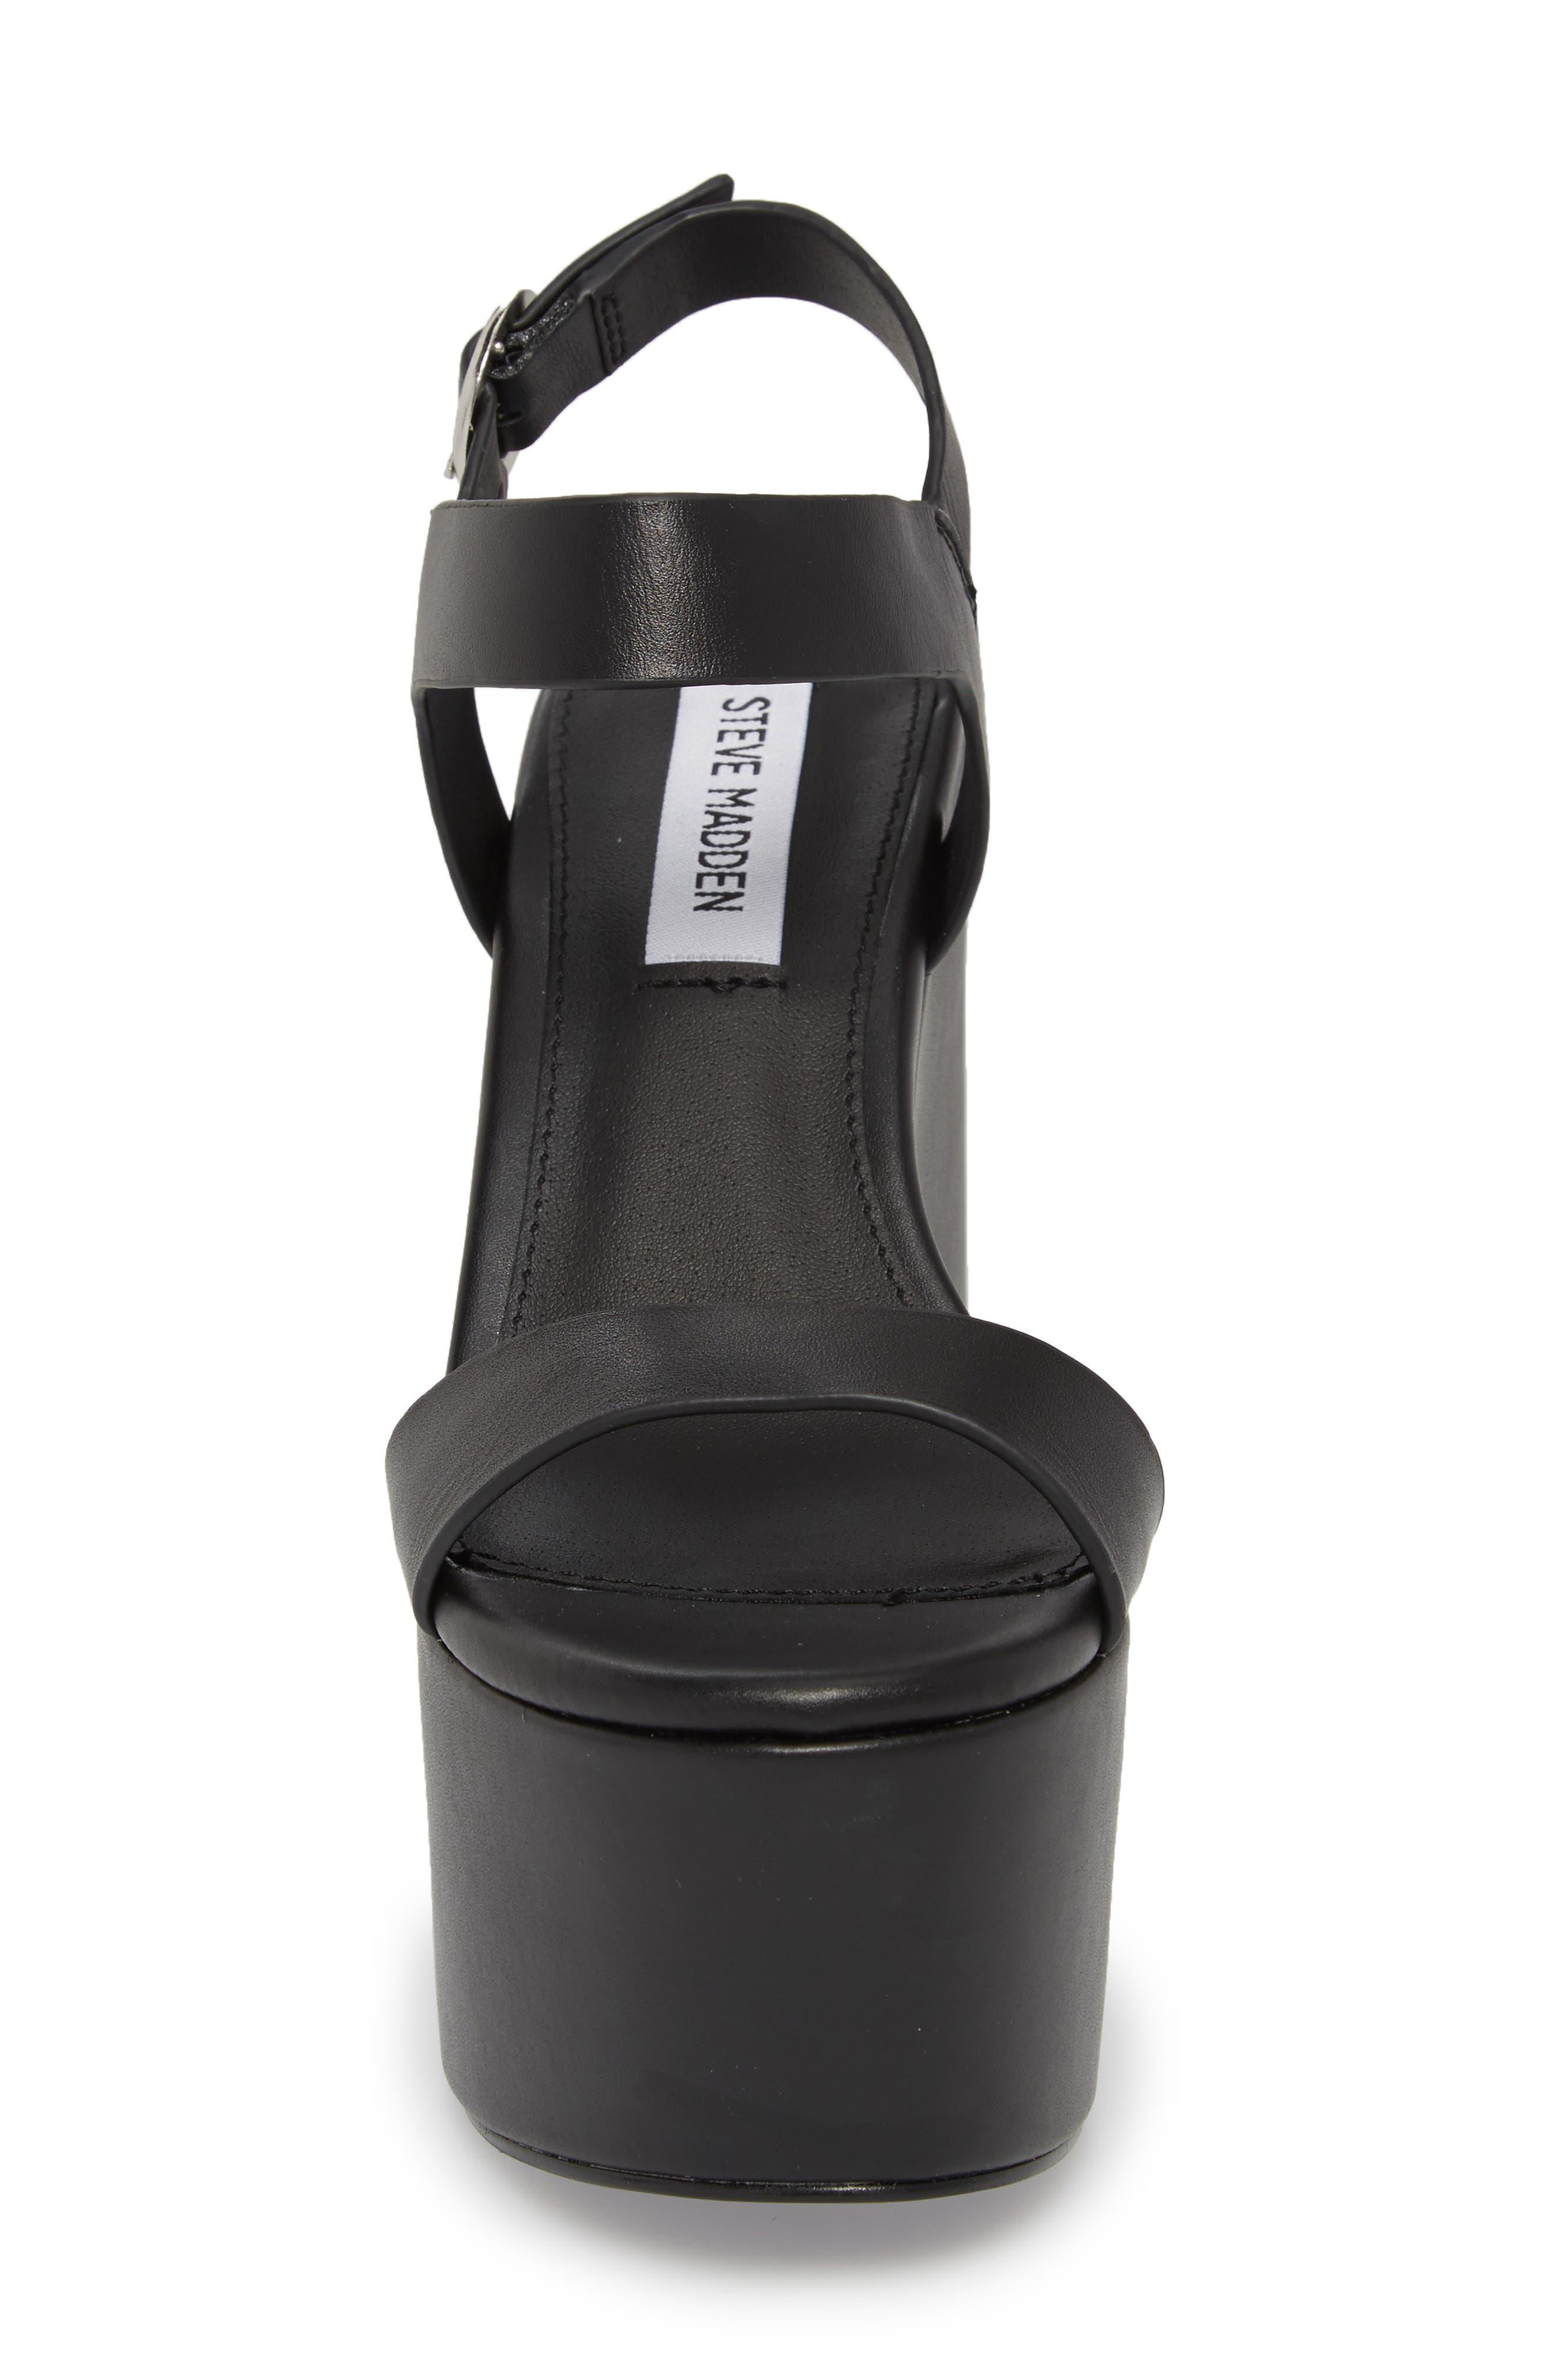 Advice Platform Sandal,                             Alternate thumbnail 4, color,                             Black Leather